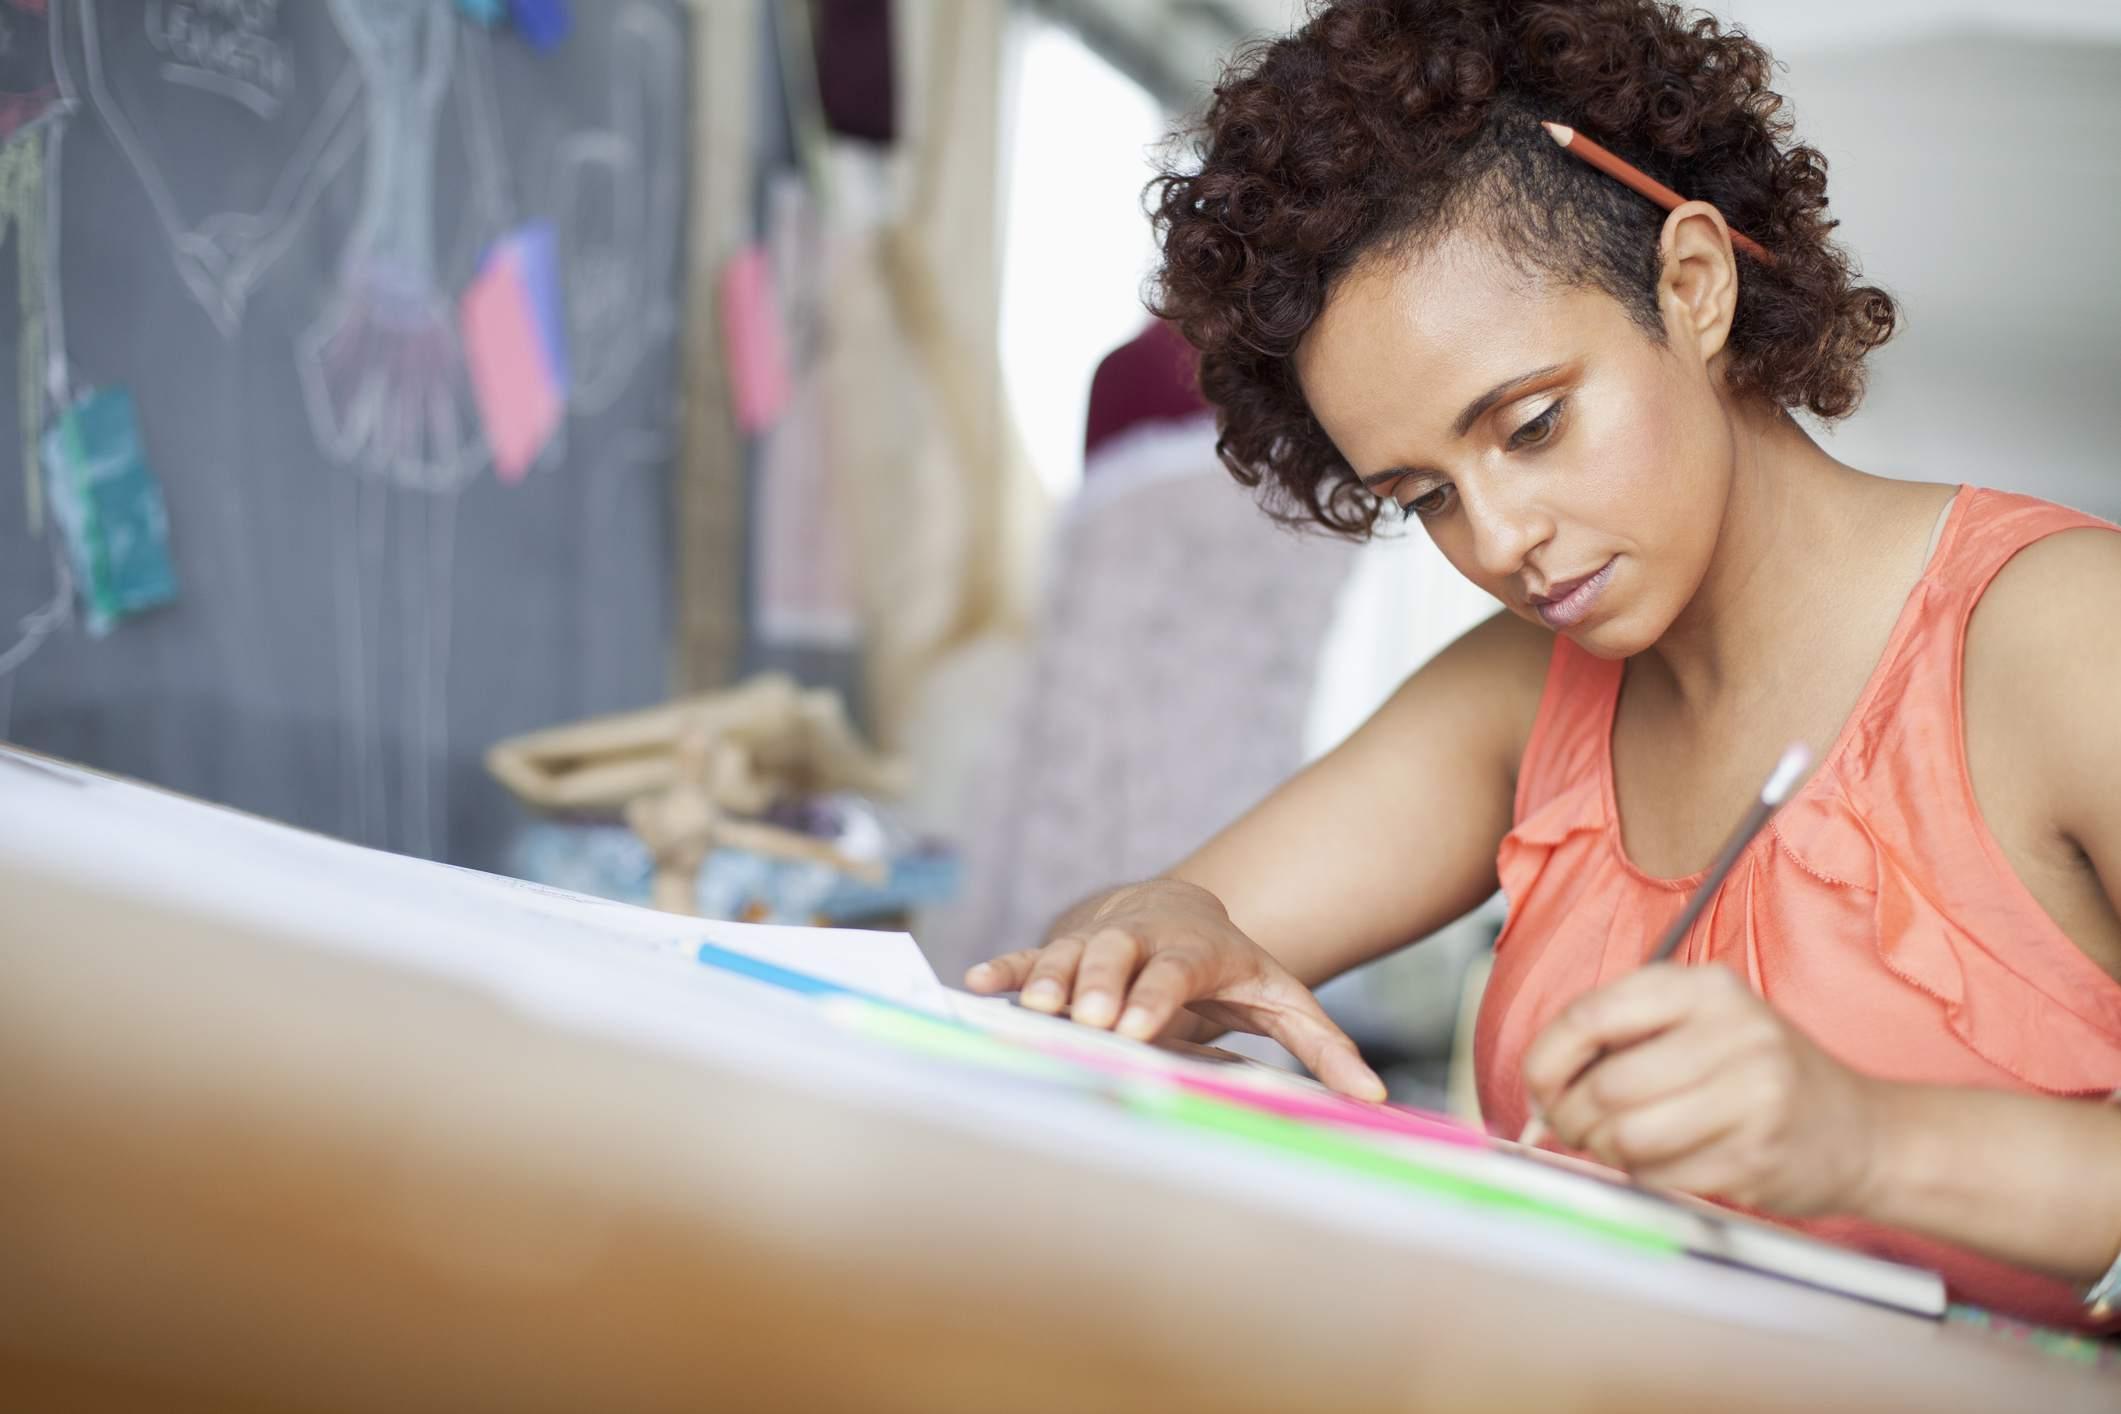 clothing designer sketching ideas in studio